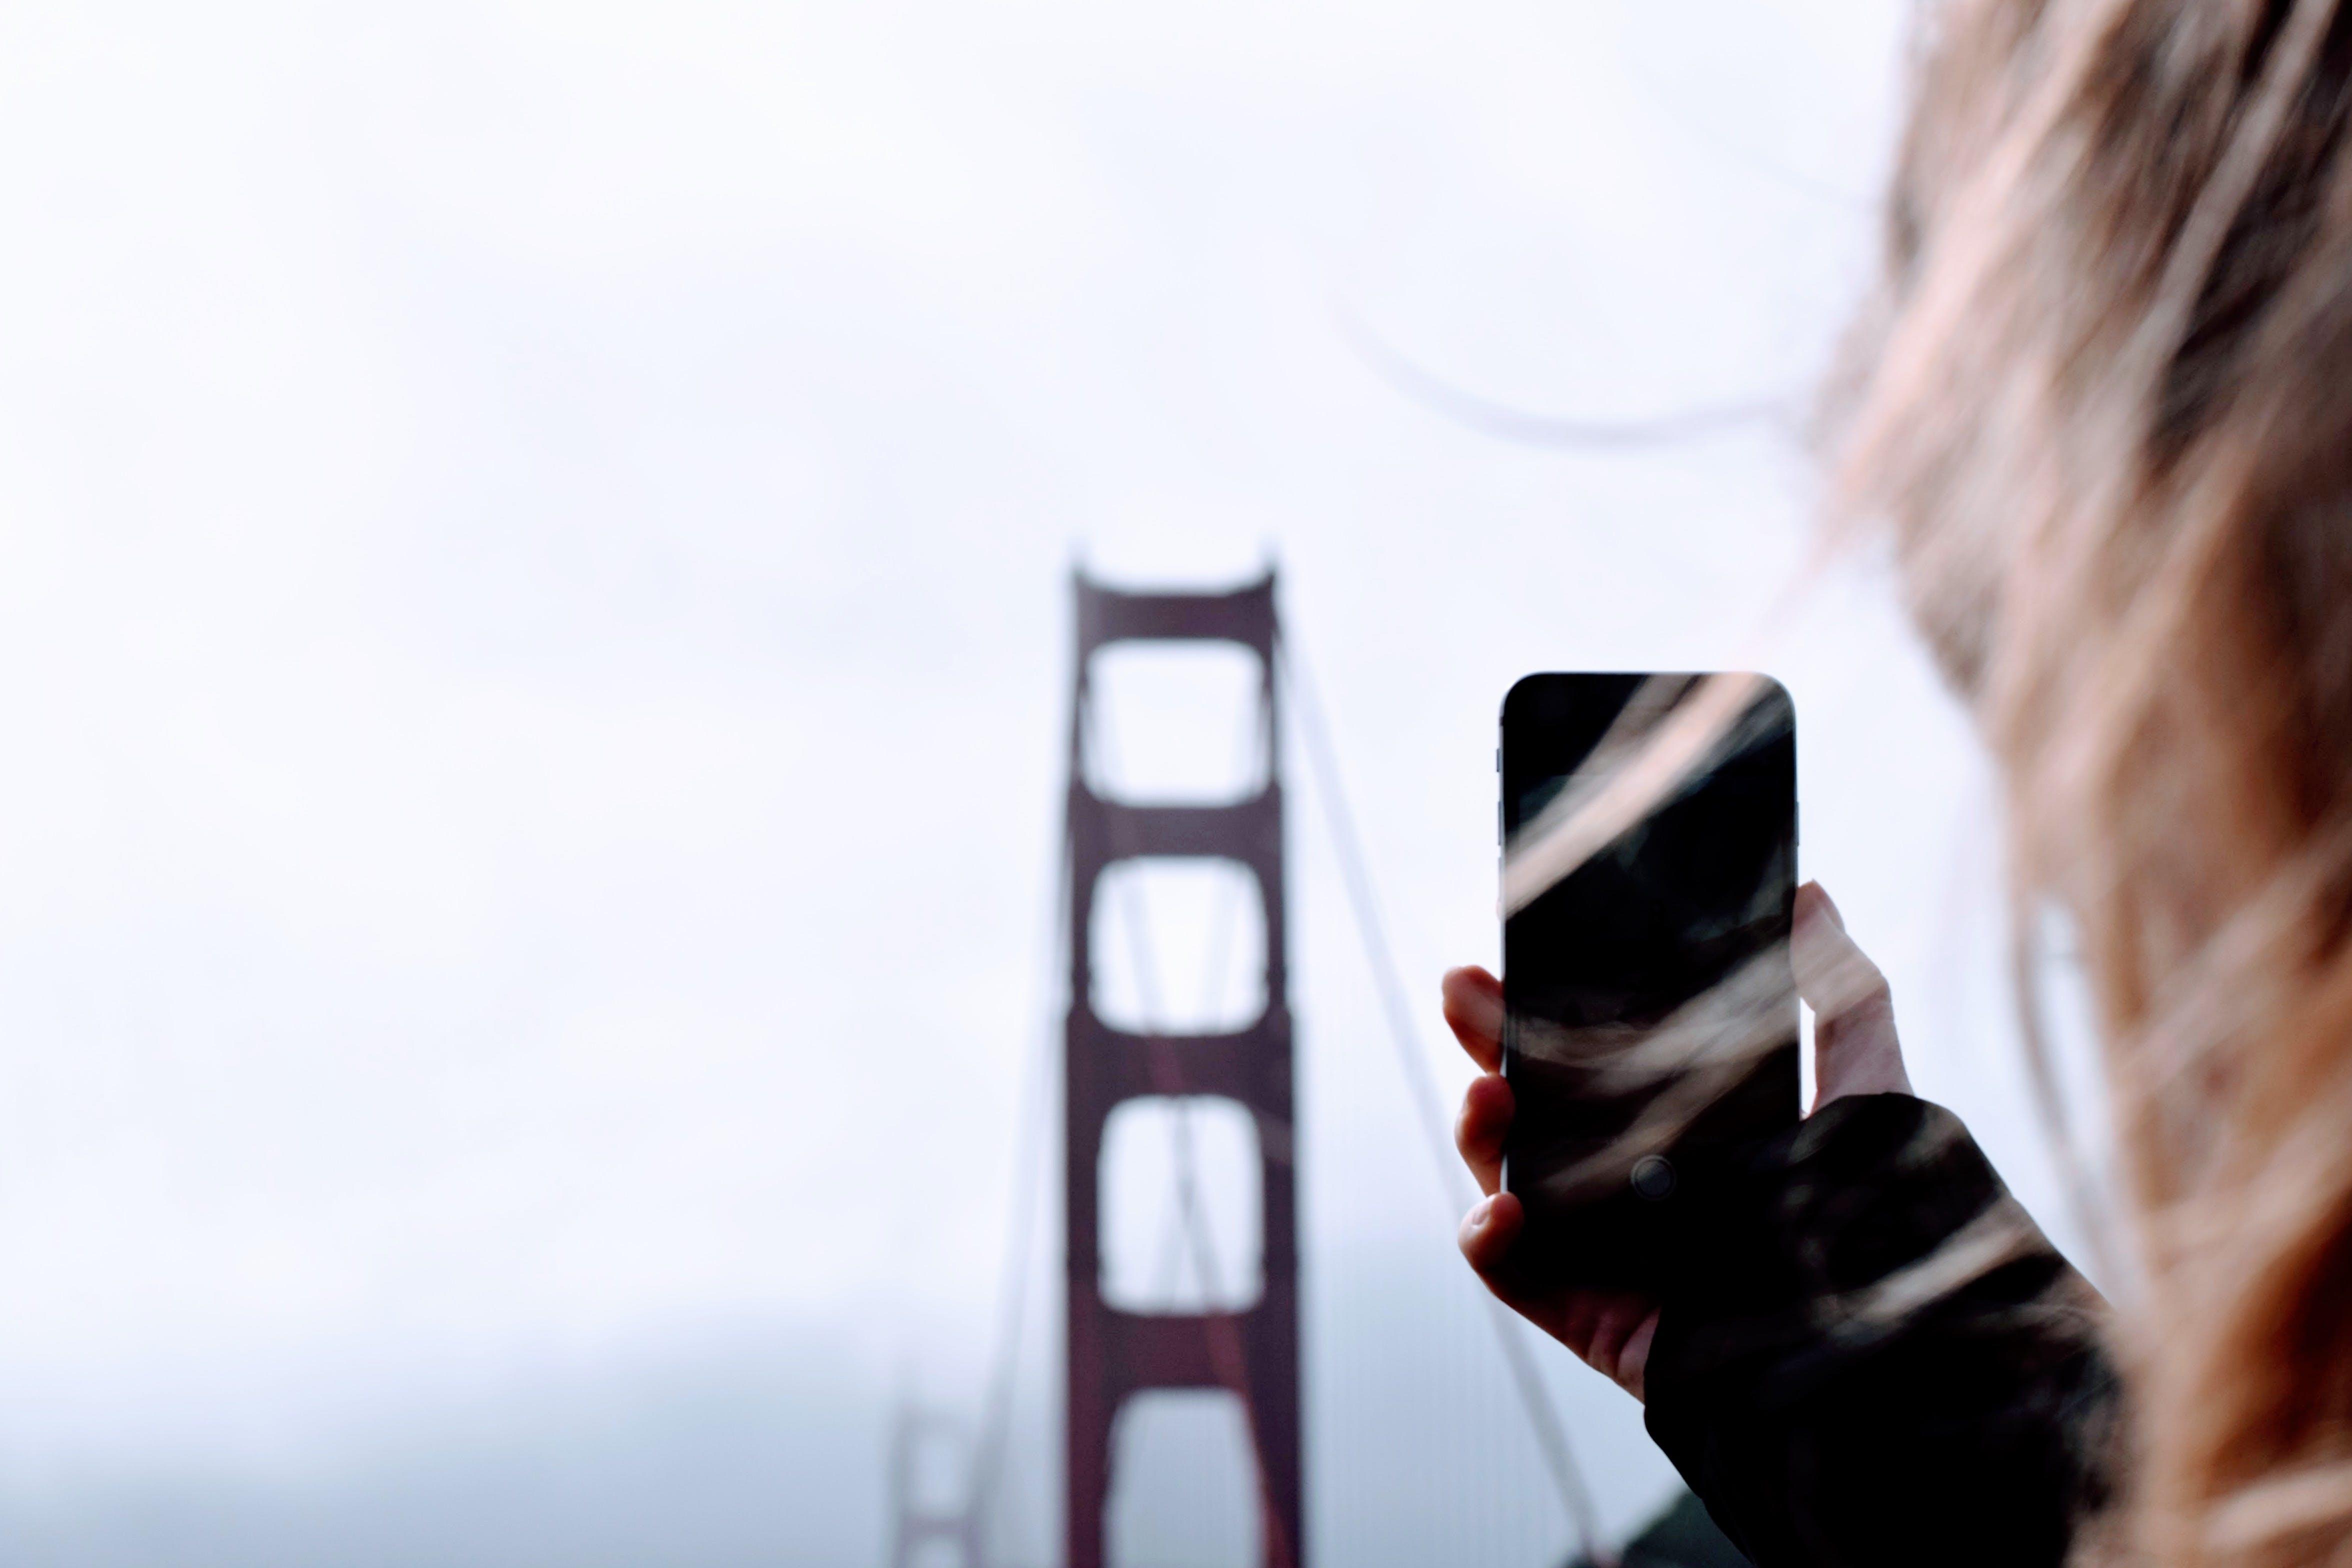 Woman in Golden Gate Bridge in San Francisco, California